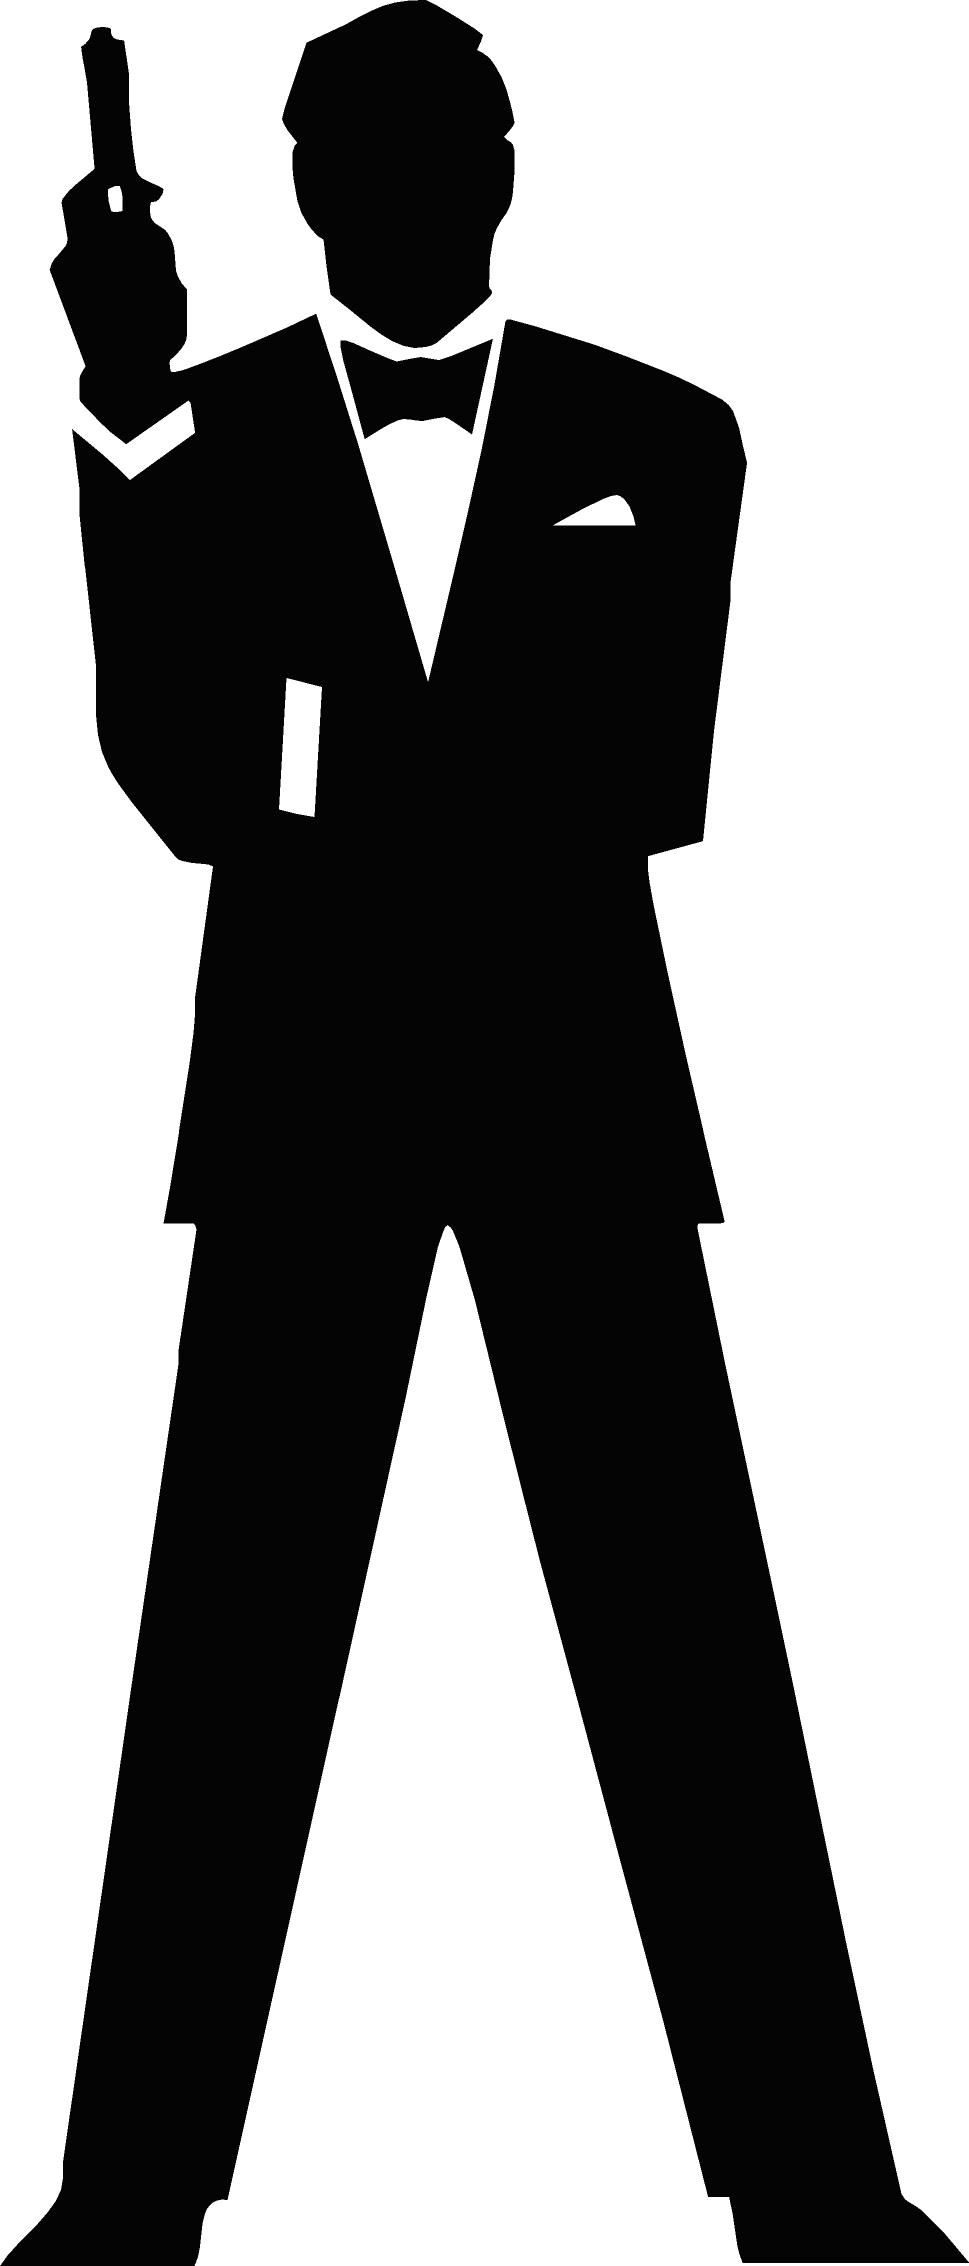 James bond clipart free image transparent free vector James Bond Secret Agent 007 Black & White Silo   Prom 16 ... image transparent